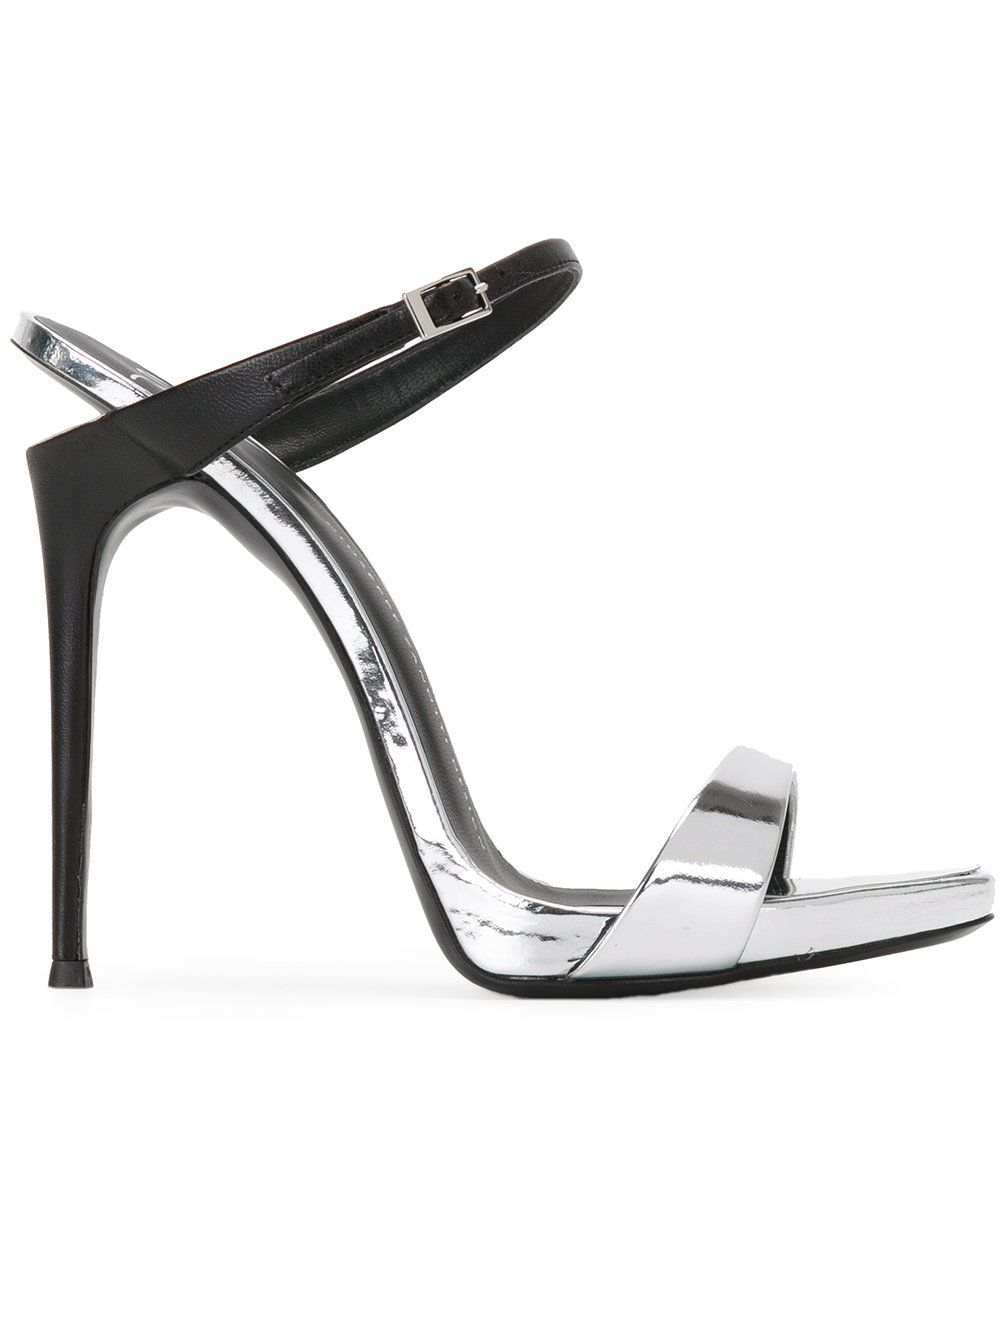 Giuseppe Zanotti Design Tania Sandals Farfetch Giuseppe Zanotti Heels Giuseppe Zanotti Shoes Stiletto Sandals